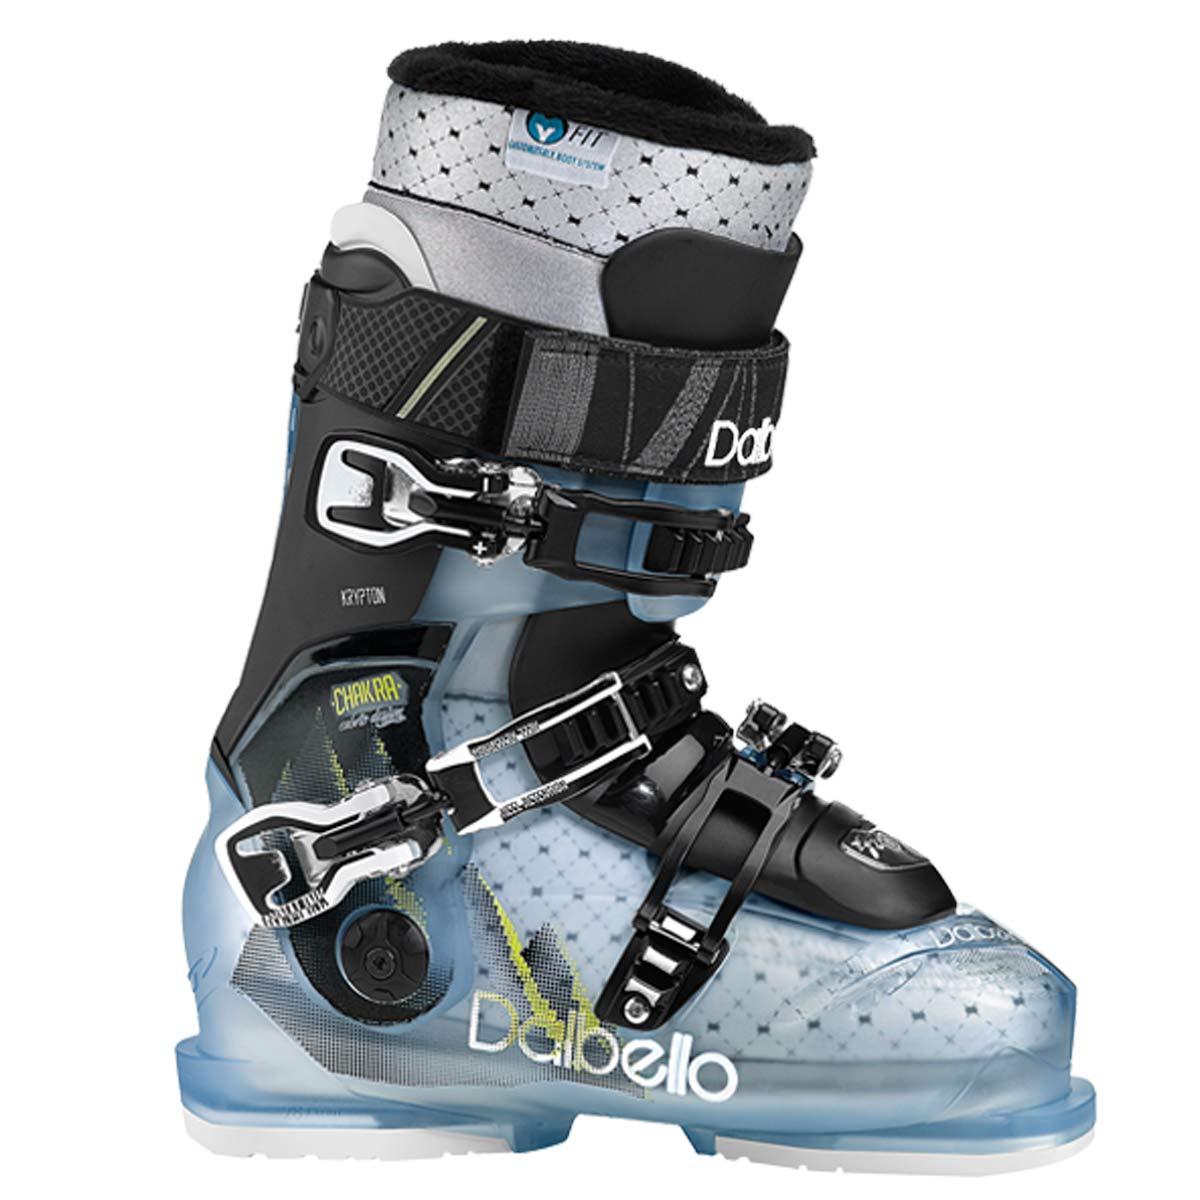 Dalbello Chakra ID Ski Boots On Sale